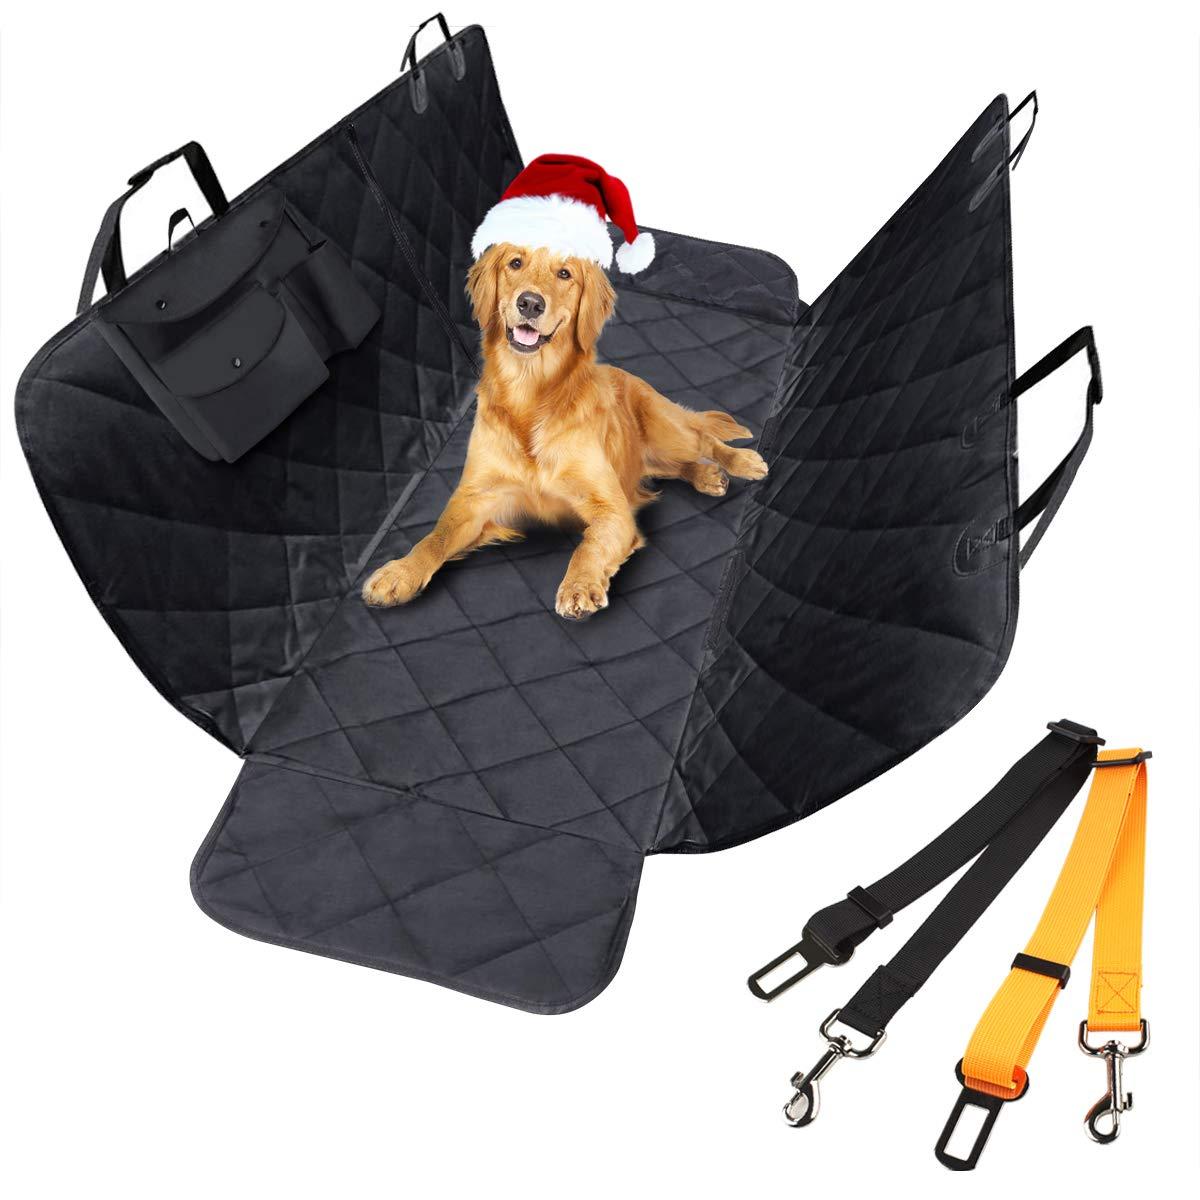 morpilot Funda Coche Perro, Cubierta Asiento Coche Perro Trasero Universal de Mascotas con 2 Cinturones